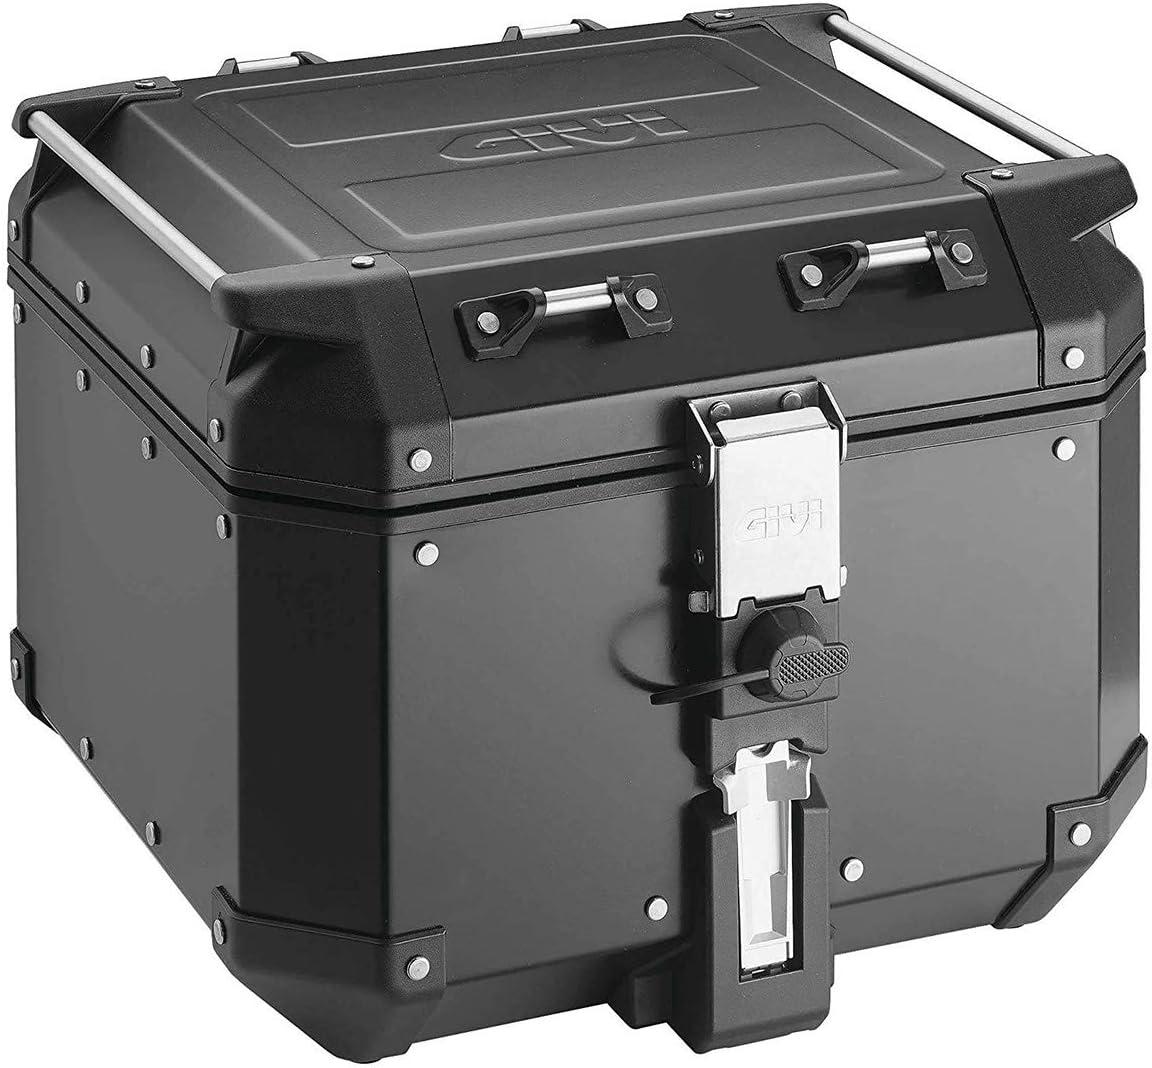 Givi OBK42B Baúl Trekker Outback Monokey, Aluminio, Color Negro, 42 litros, Carga Máxima 10 Kg